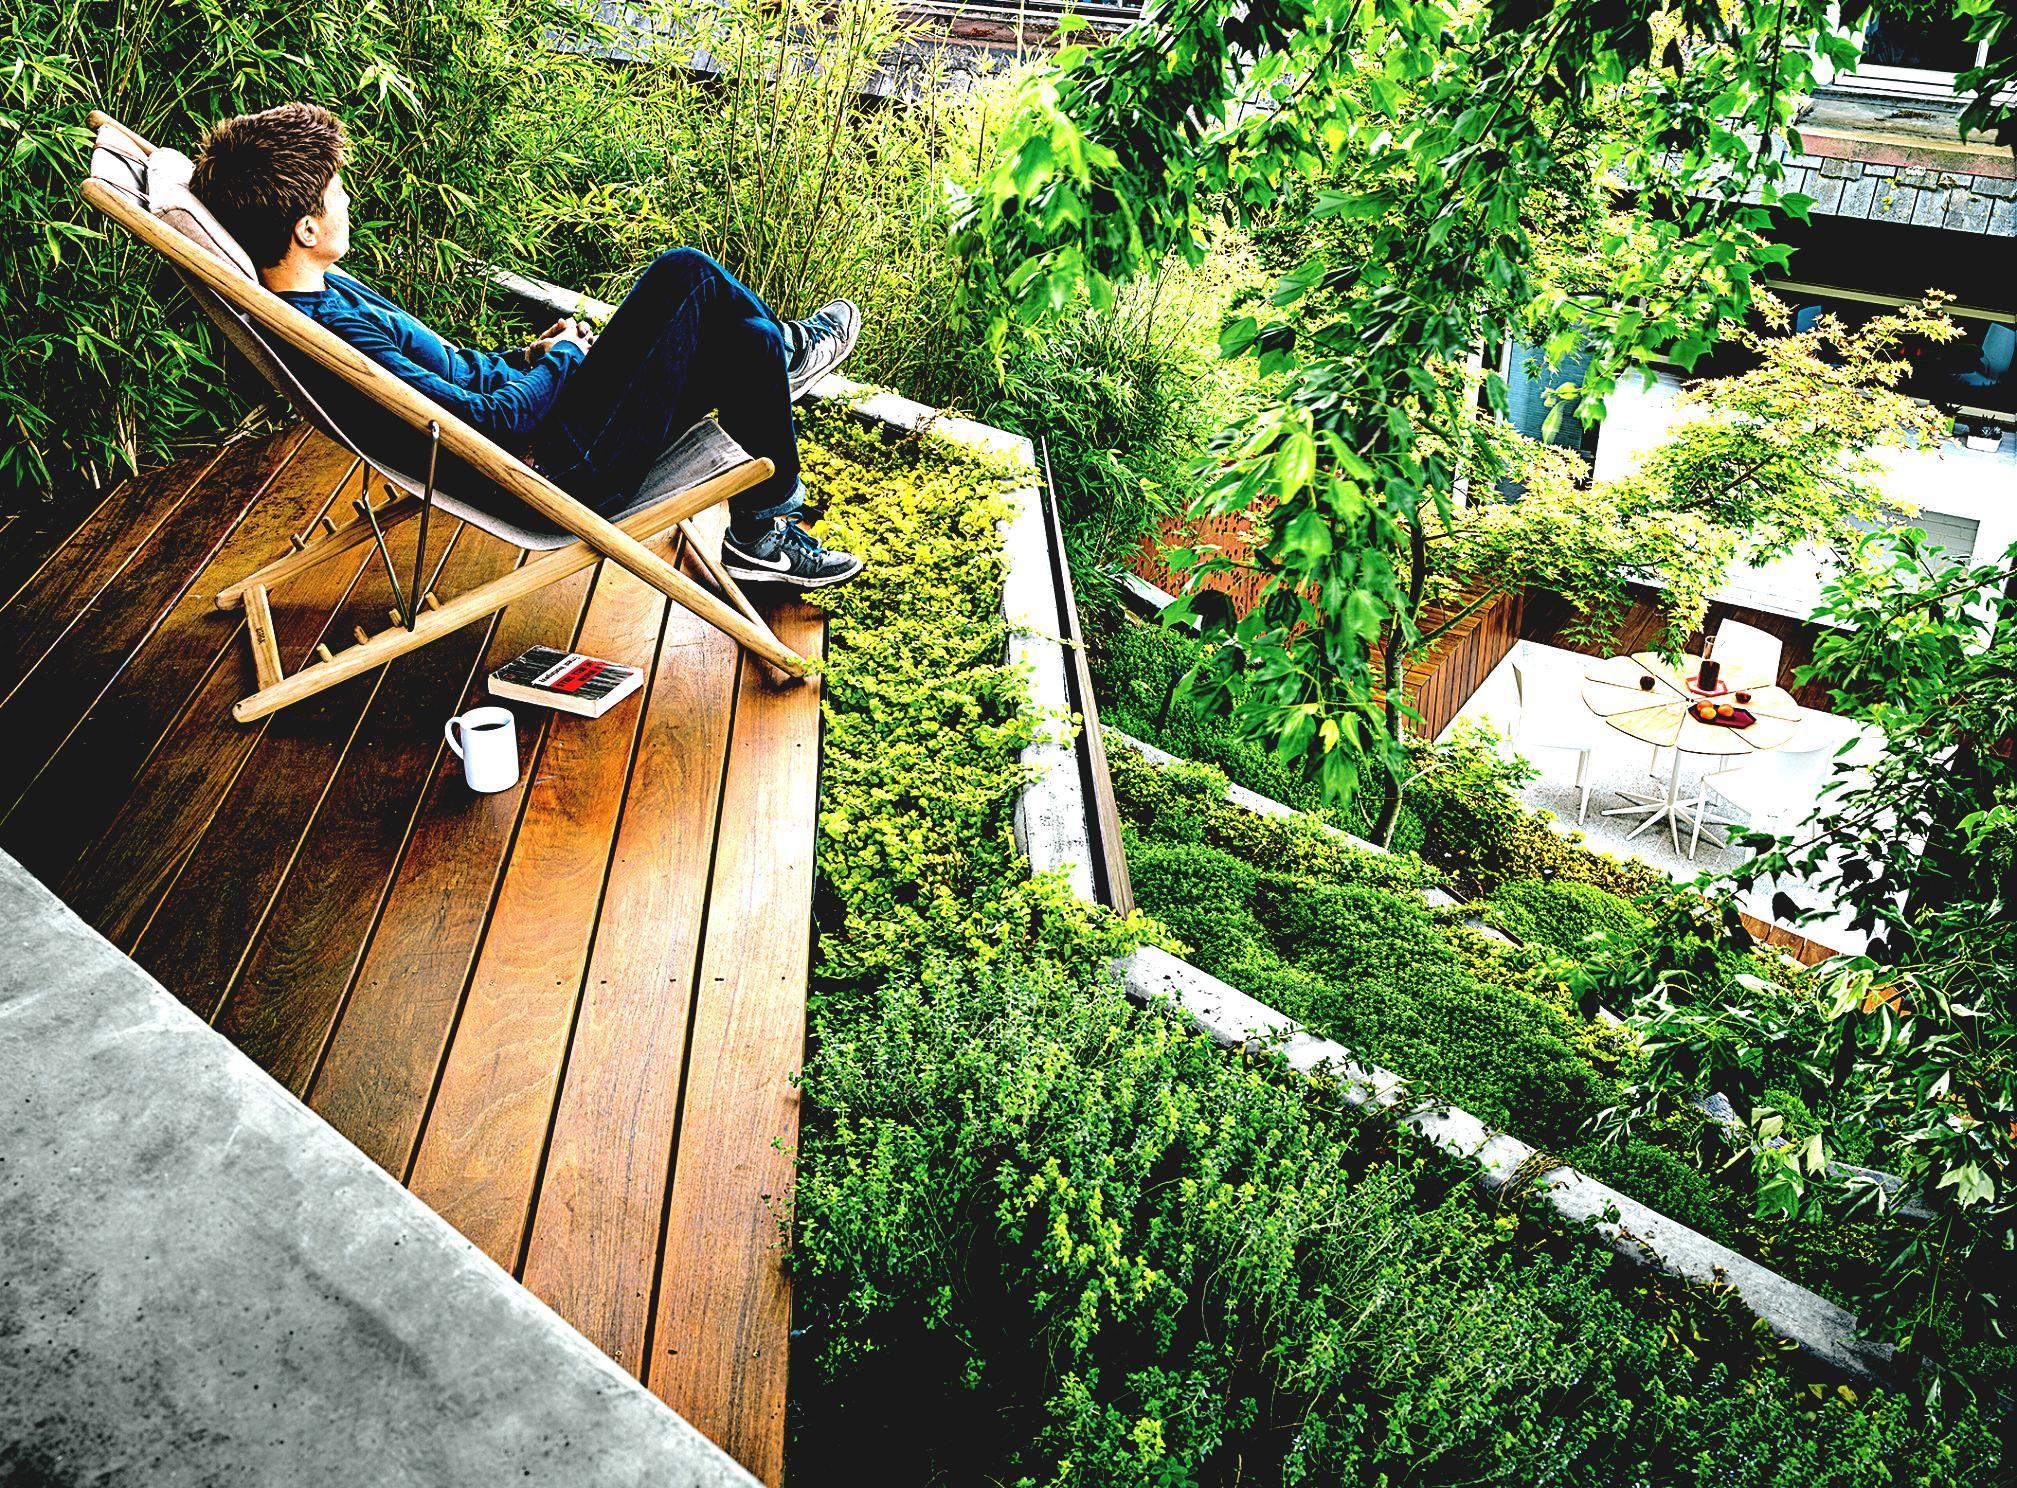 Landscape Ideas For Steep Backyard Hill The Garden ... on Steep Sloping Garden Ideas id=51213